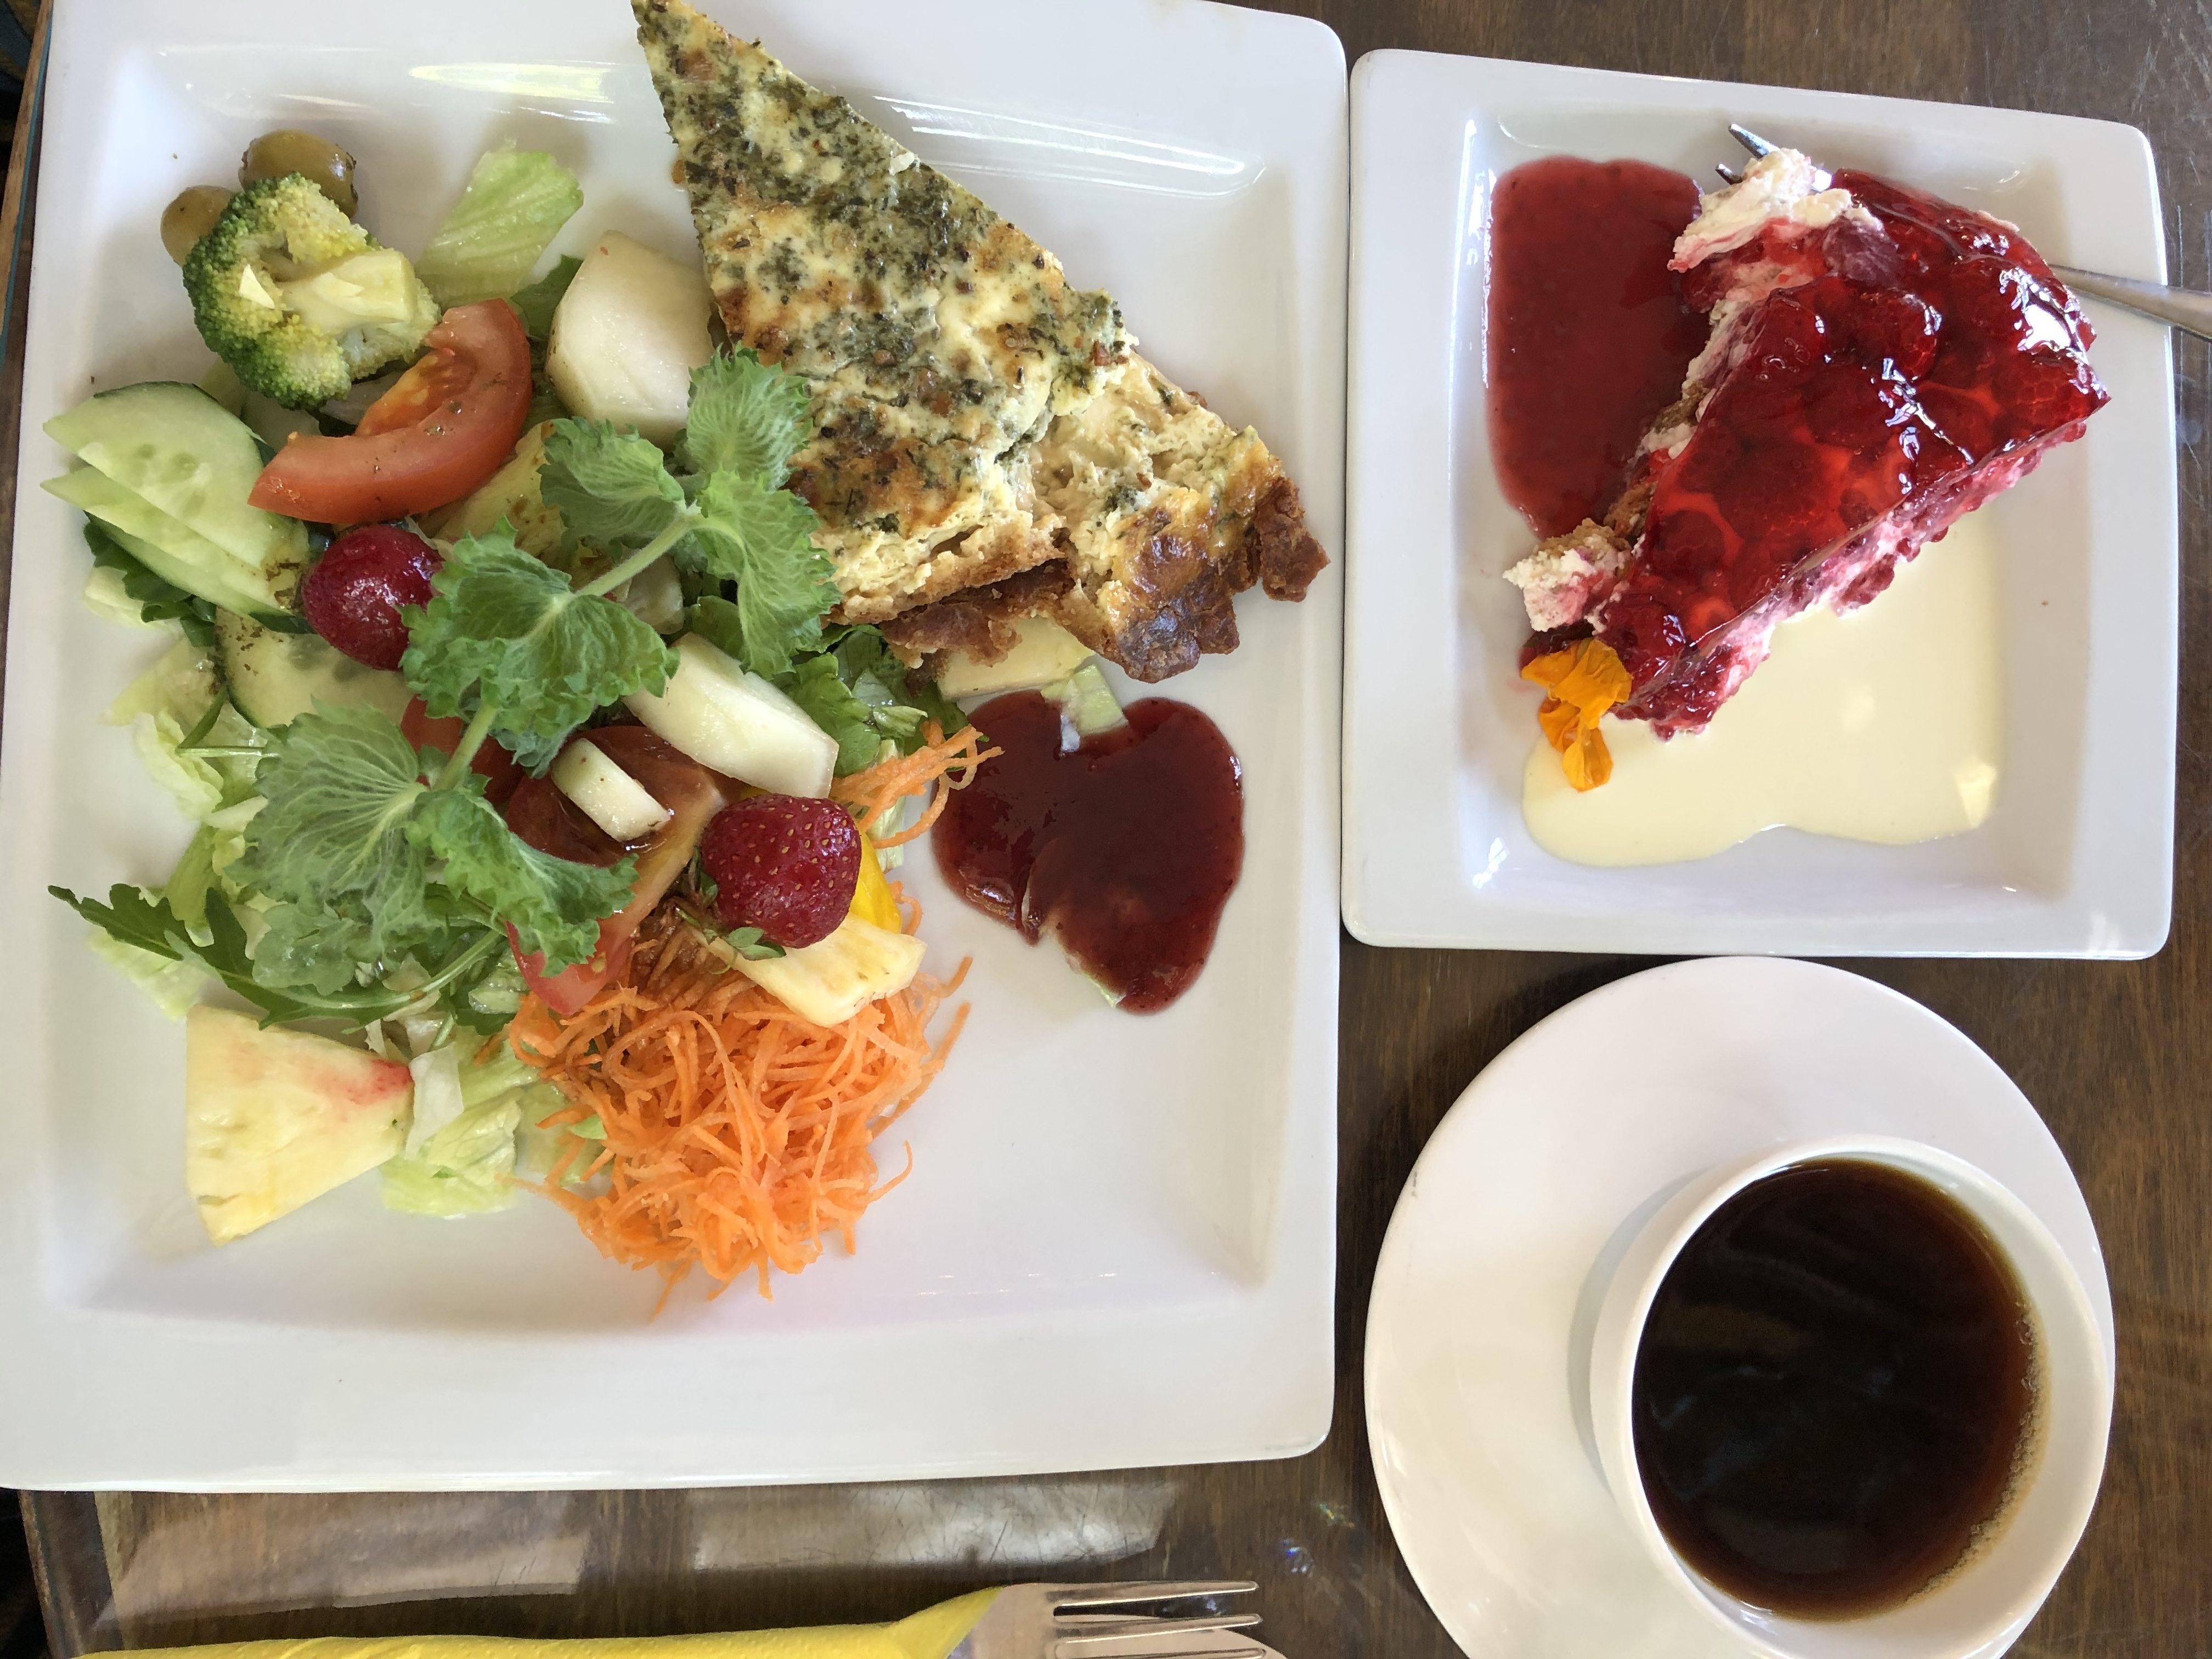 Porvoon ruokapaikat ja kahvilat Cafe Cabriole